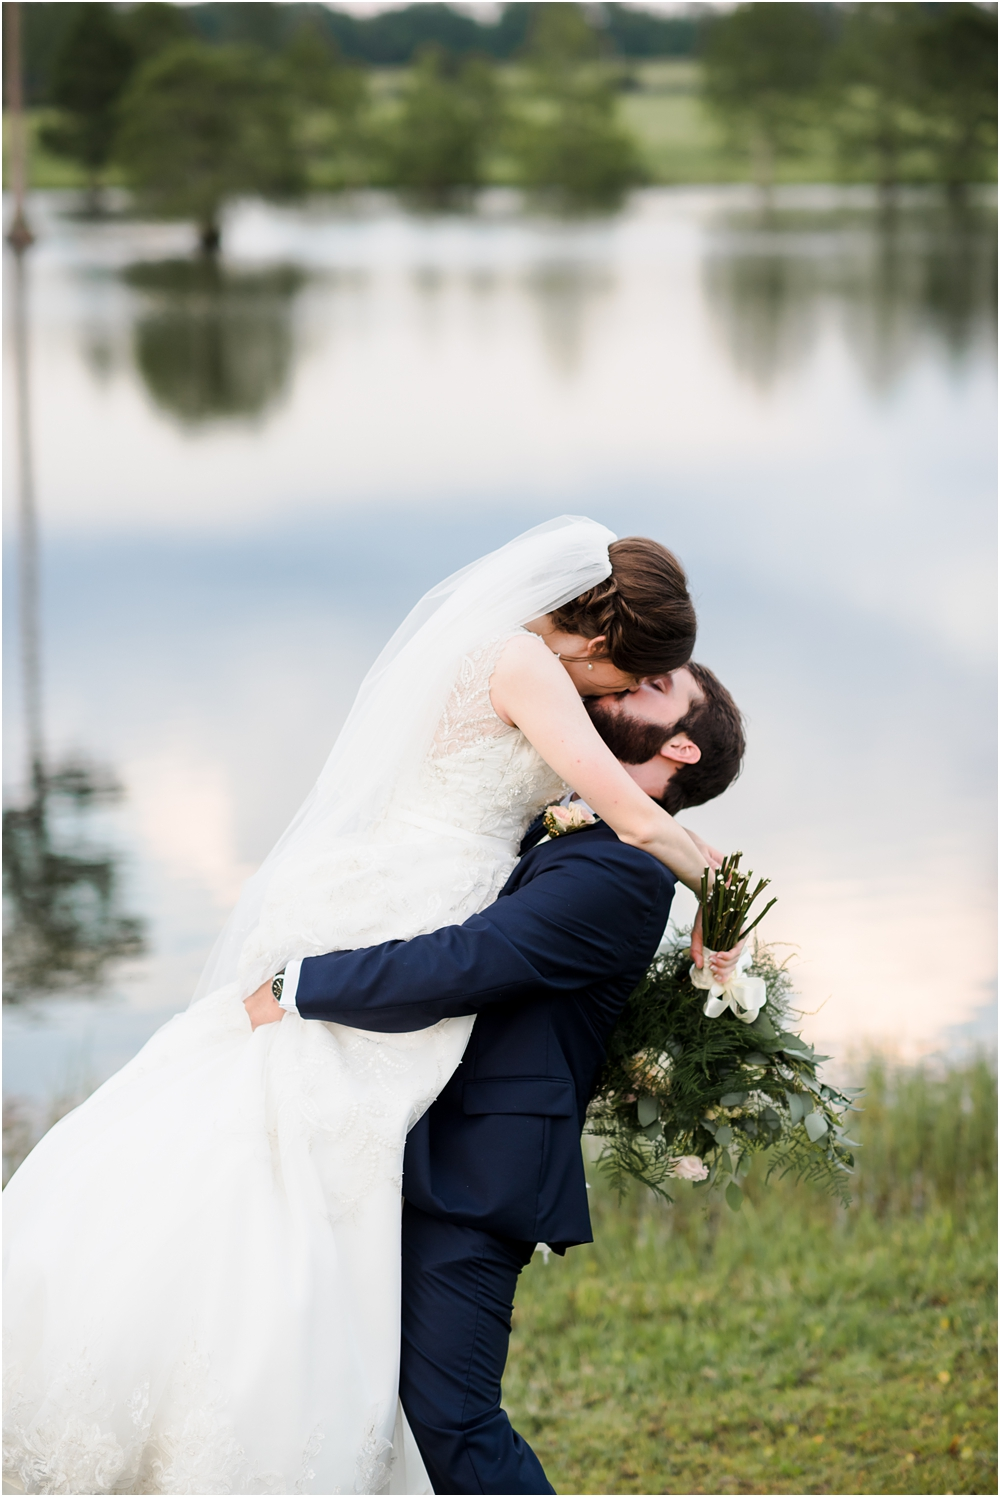 marianna-florida-wedding-photographer-kiersten-grant-151.jpg